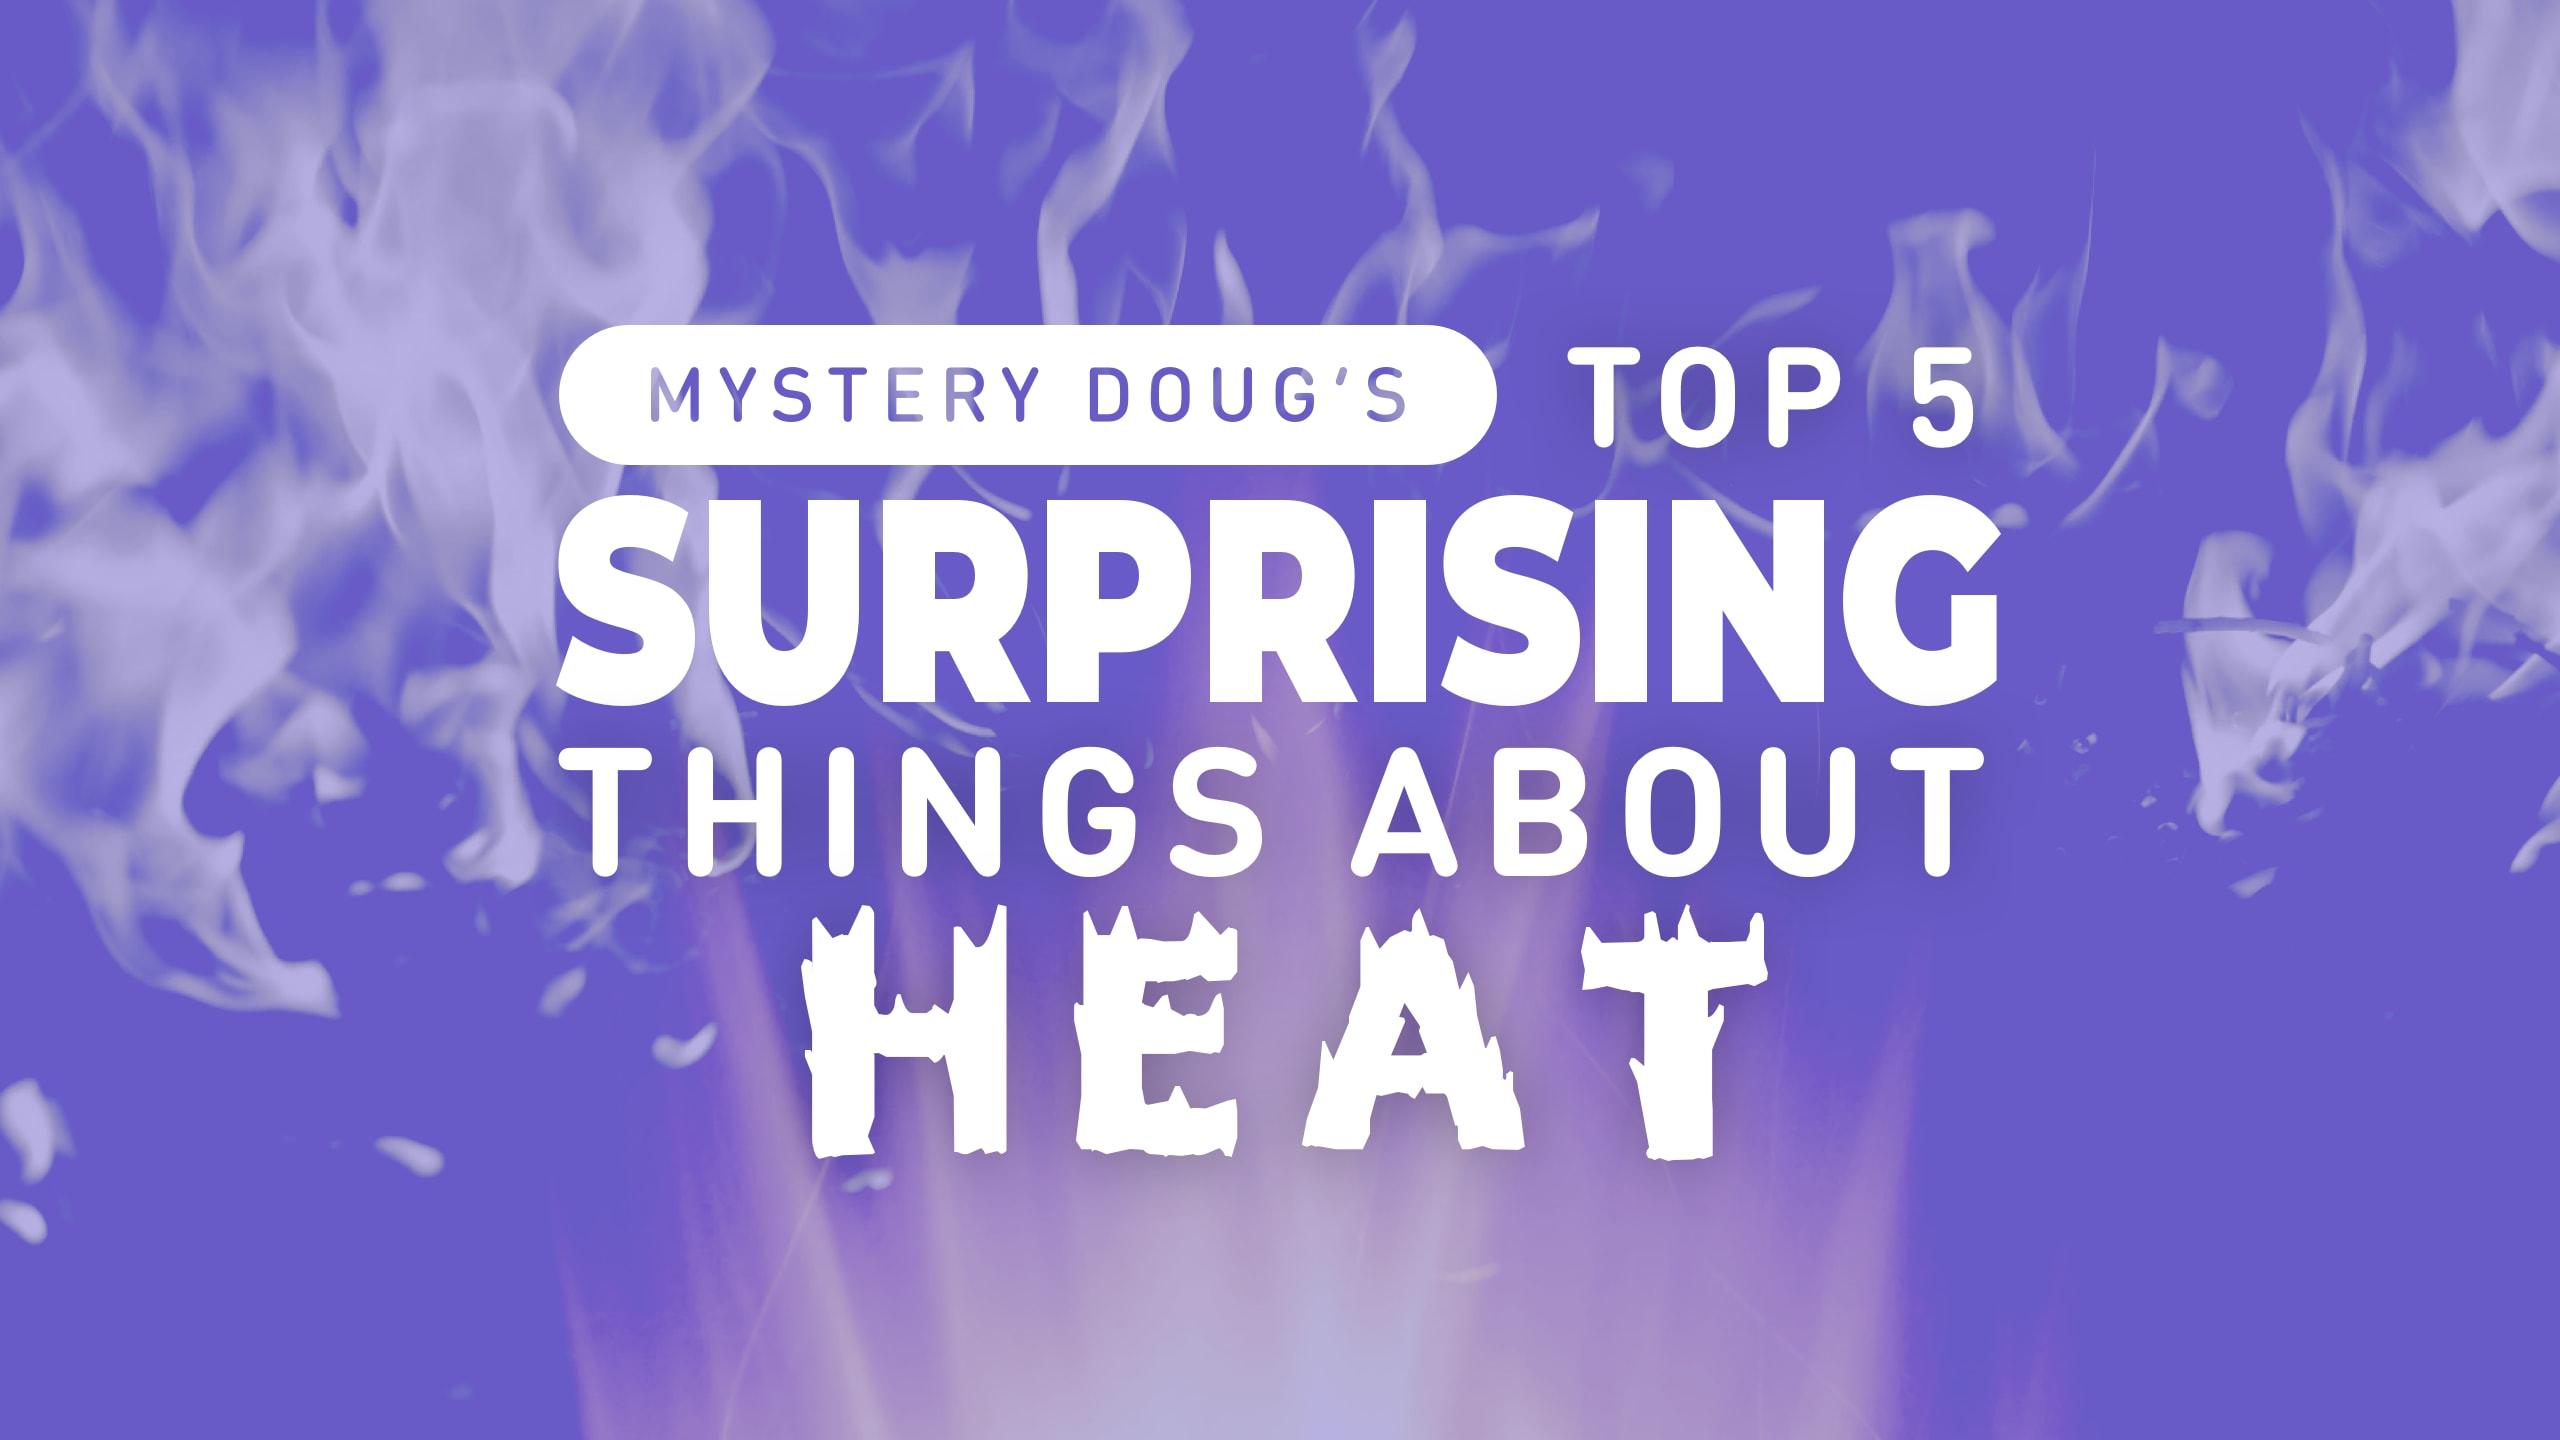 Top5 heat title